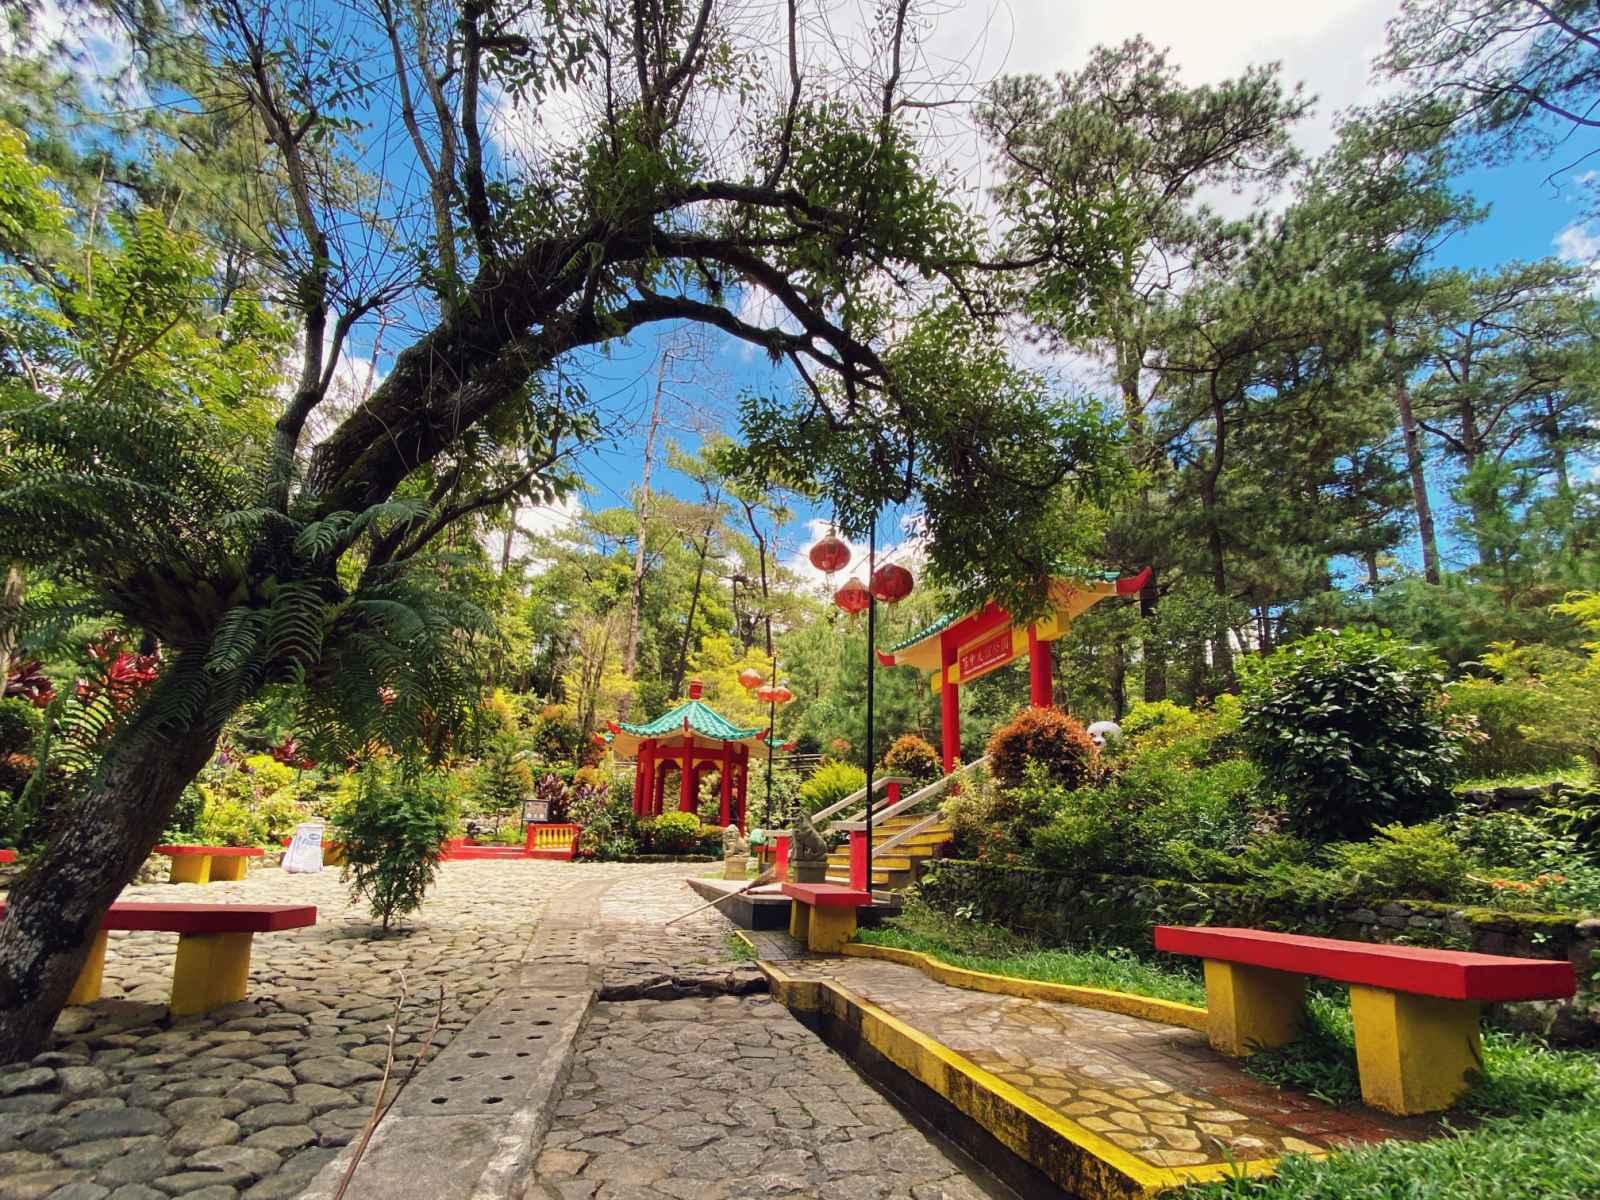 Botanical garden in Baguio